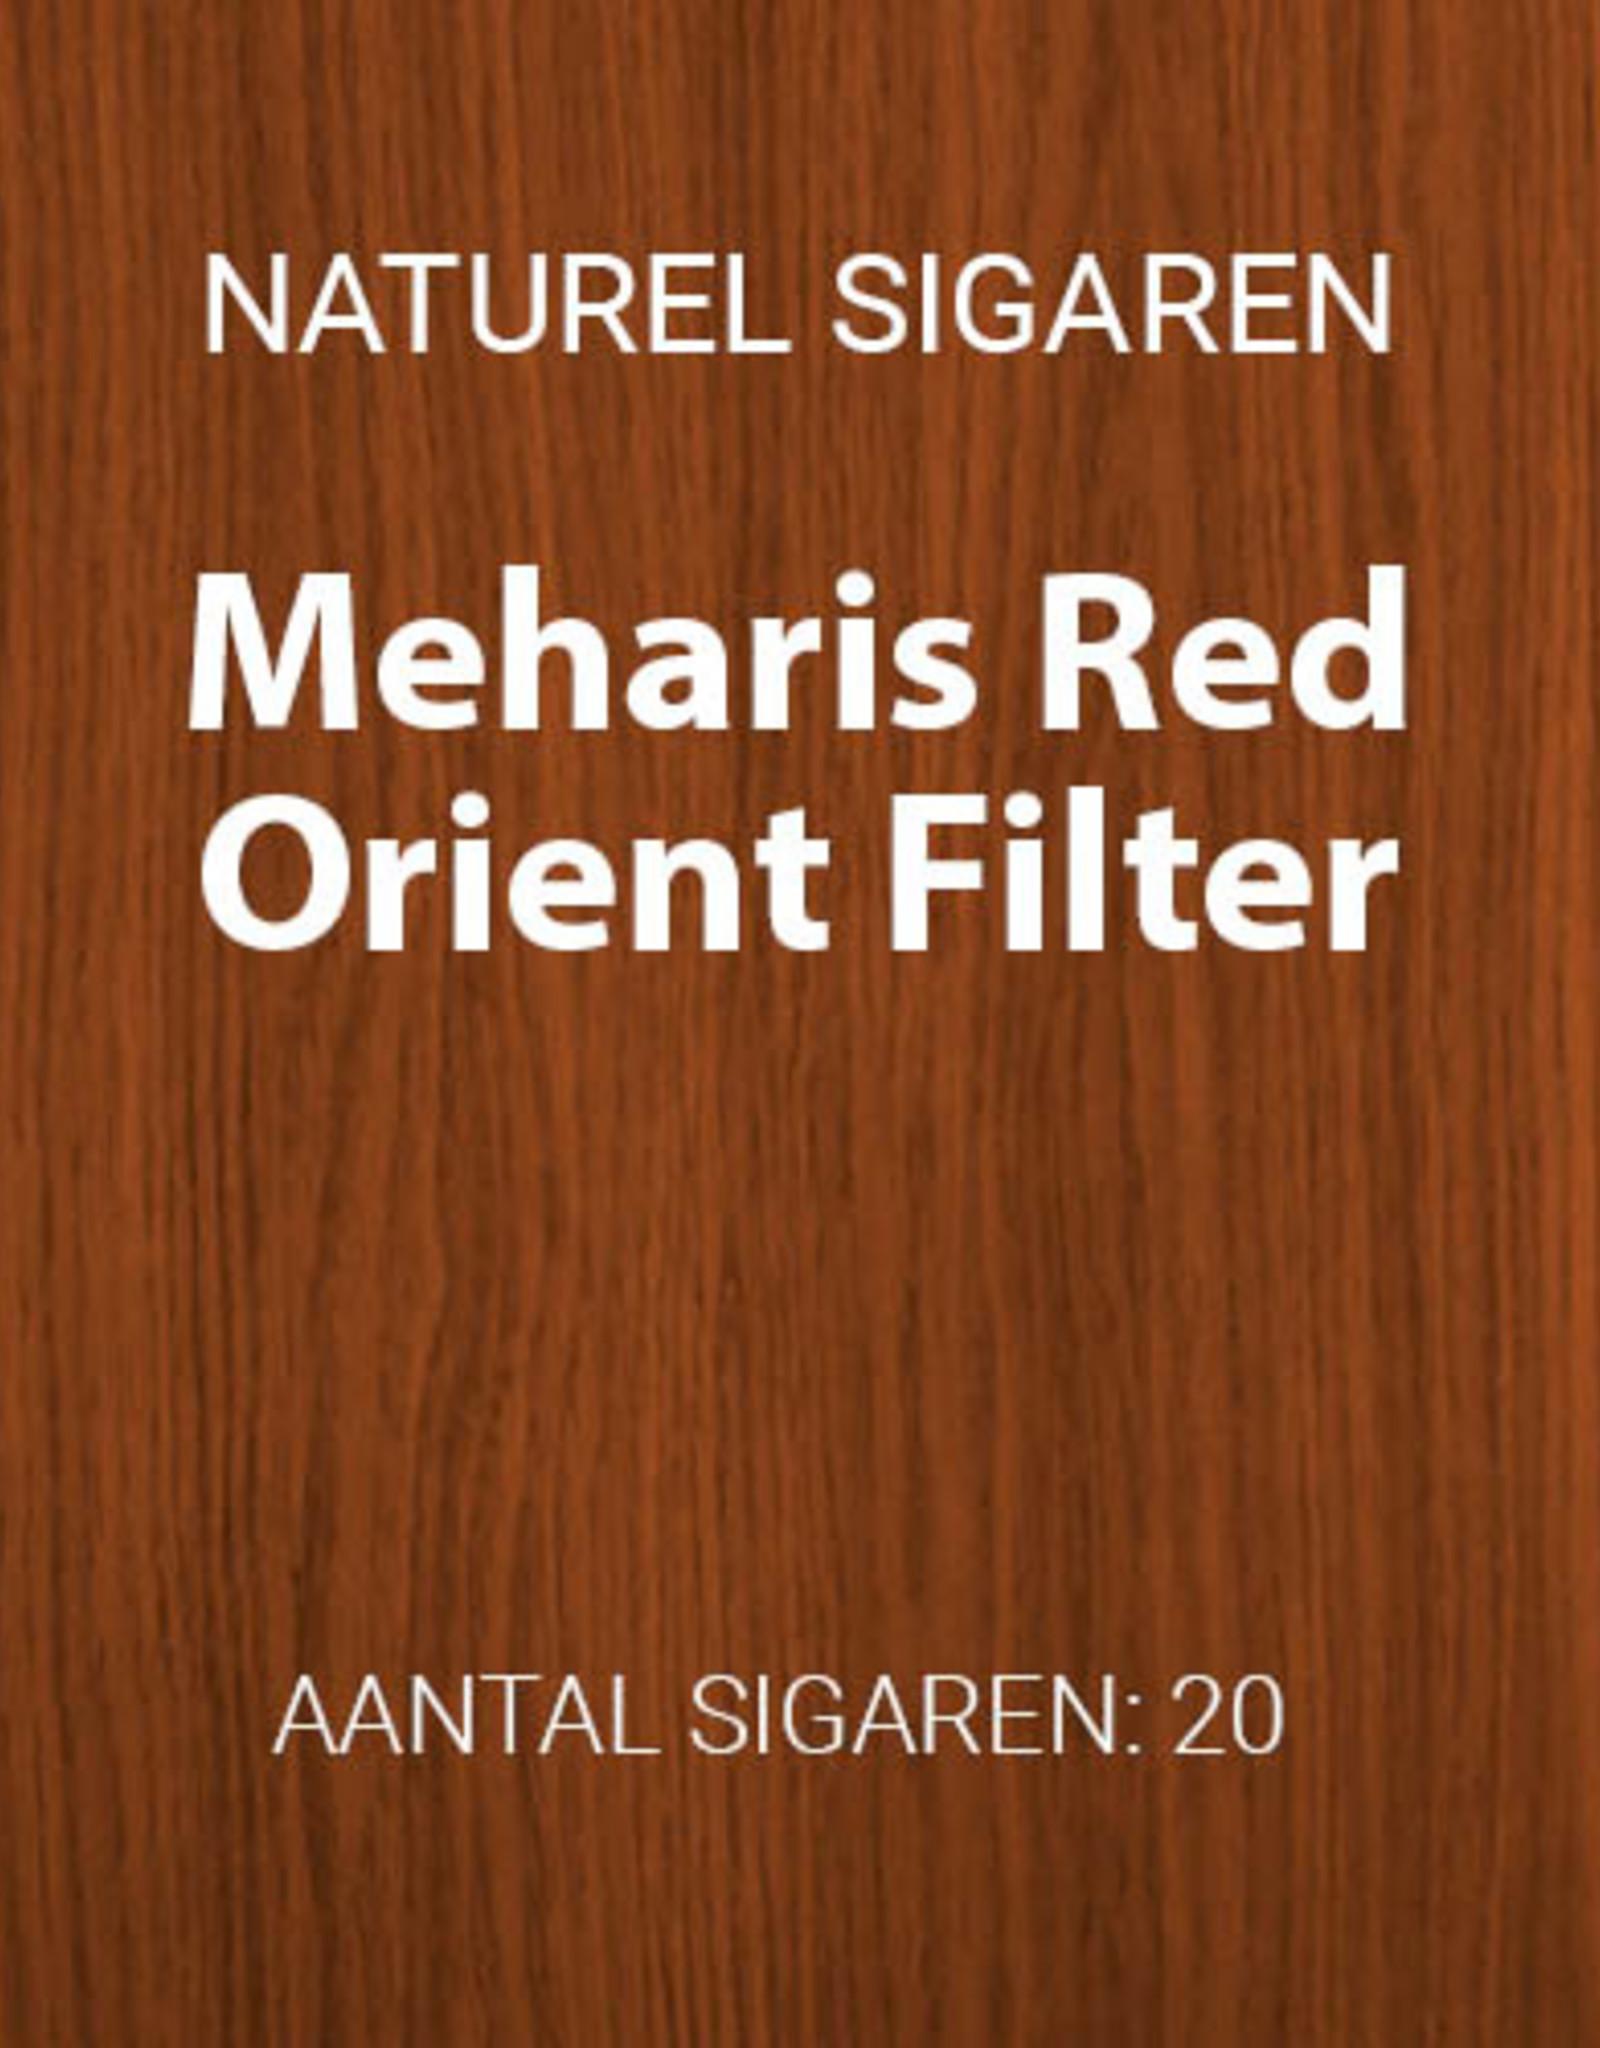 Meharis Mehari's Red Orient FILTER